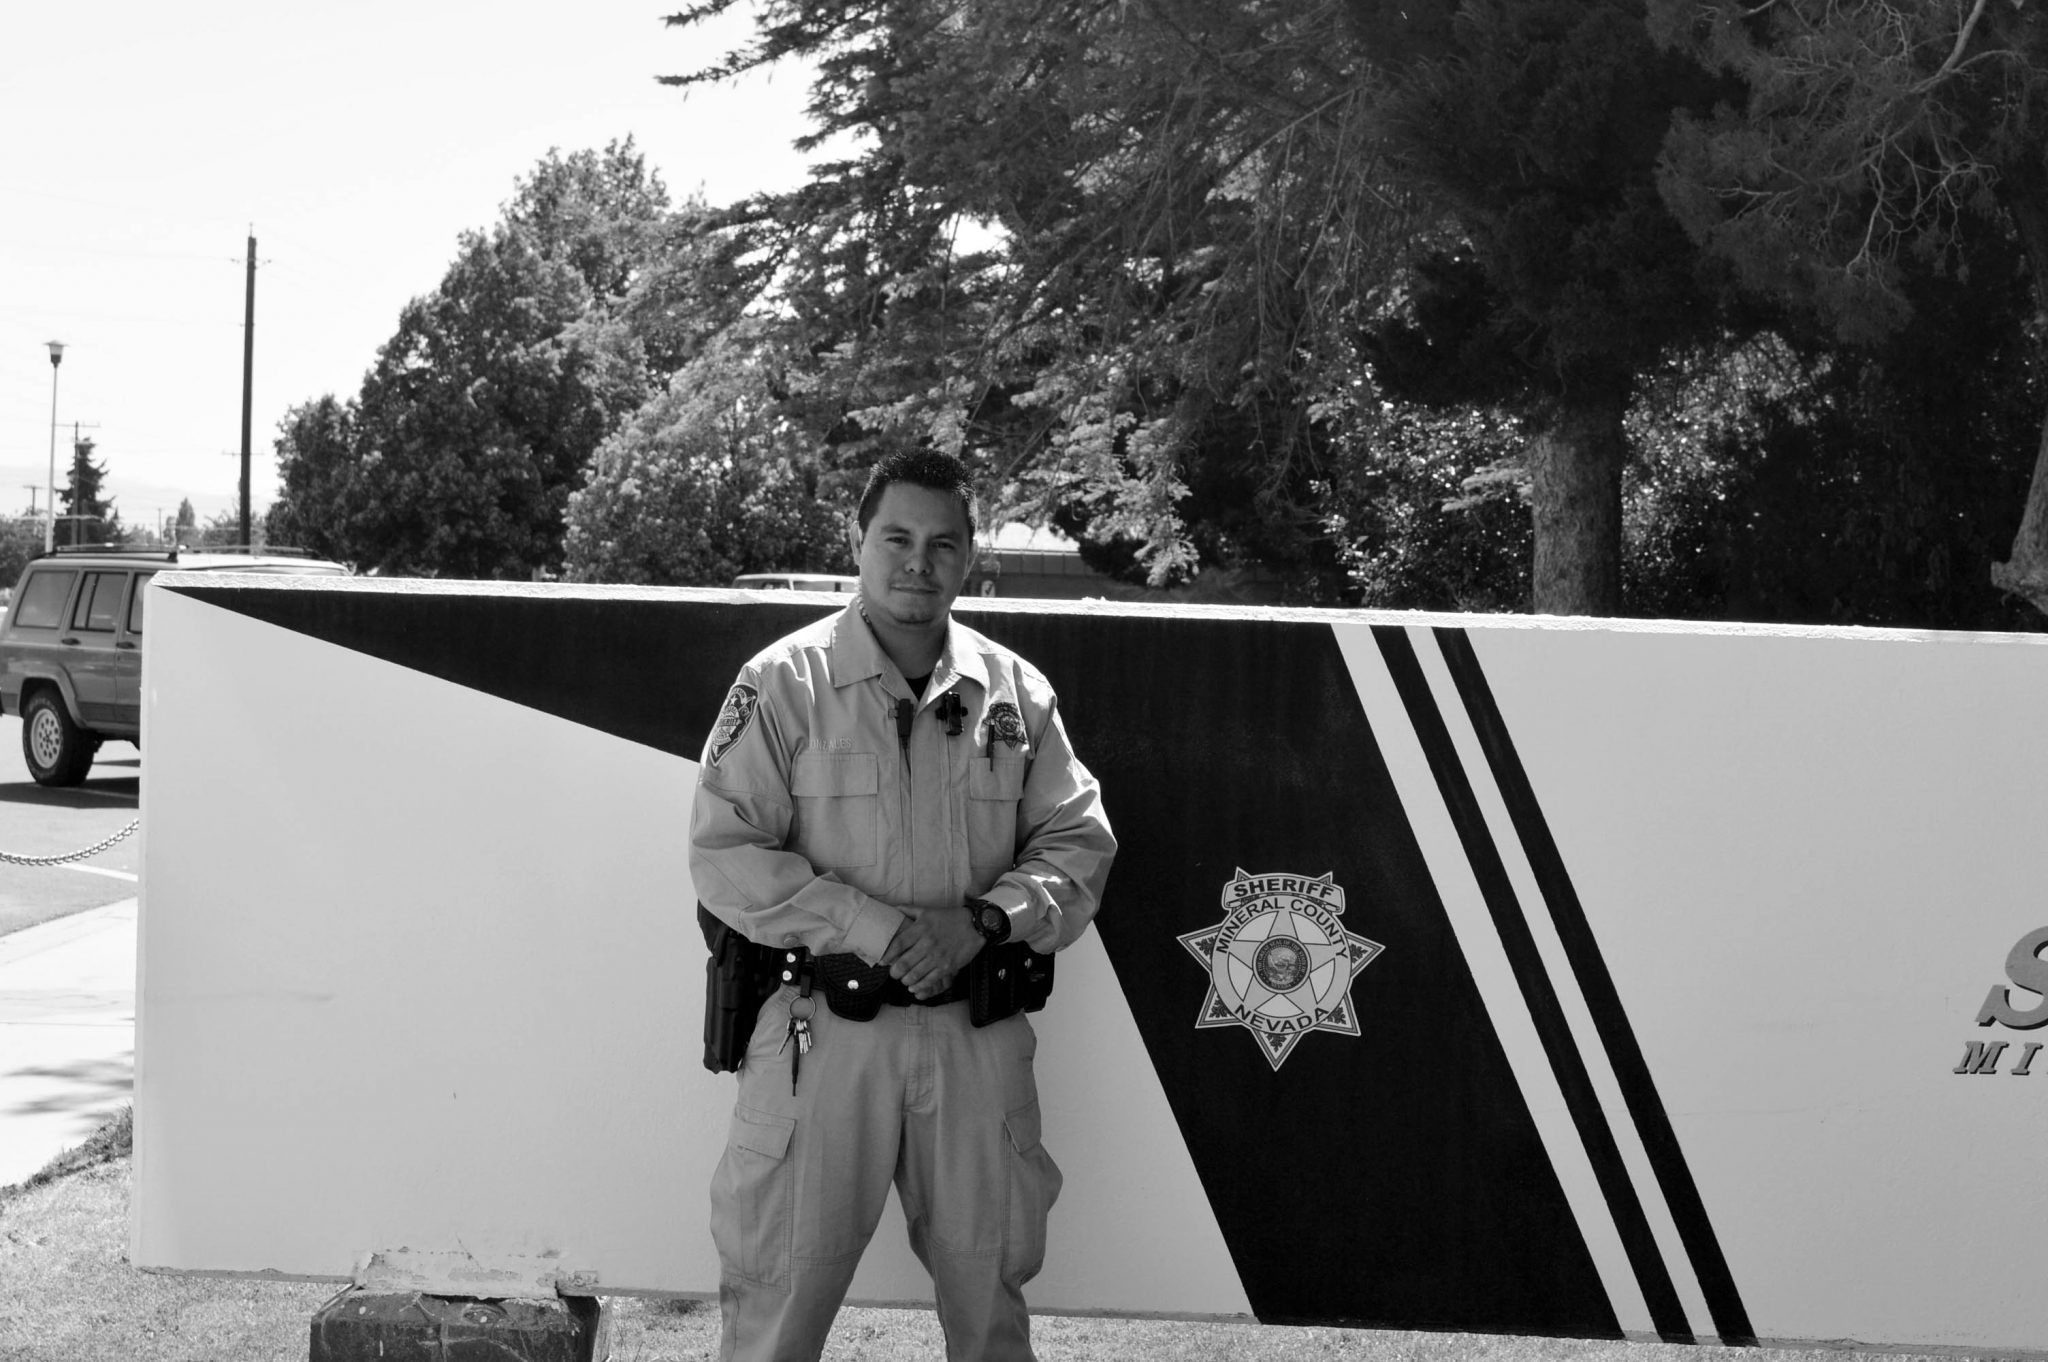 Coming full circle: Gonzales fulfills boyhood dream of law enforcement